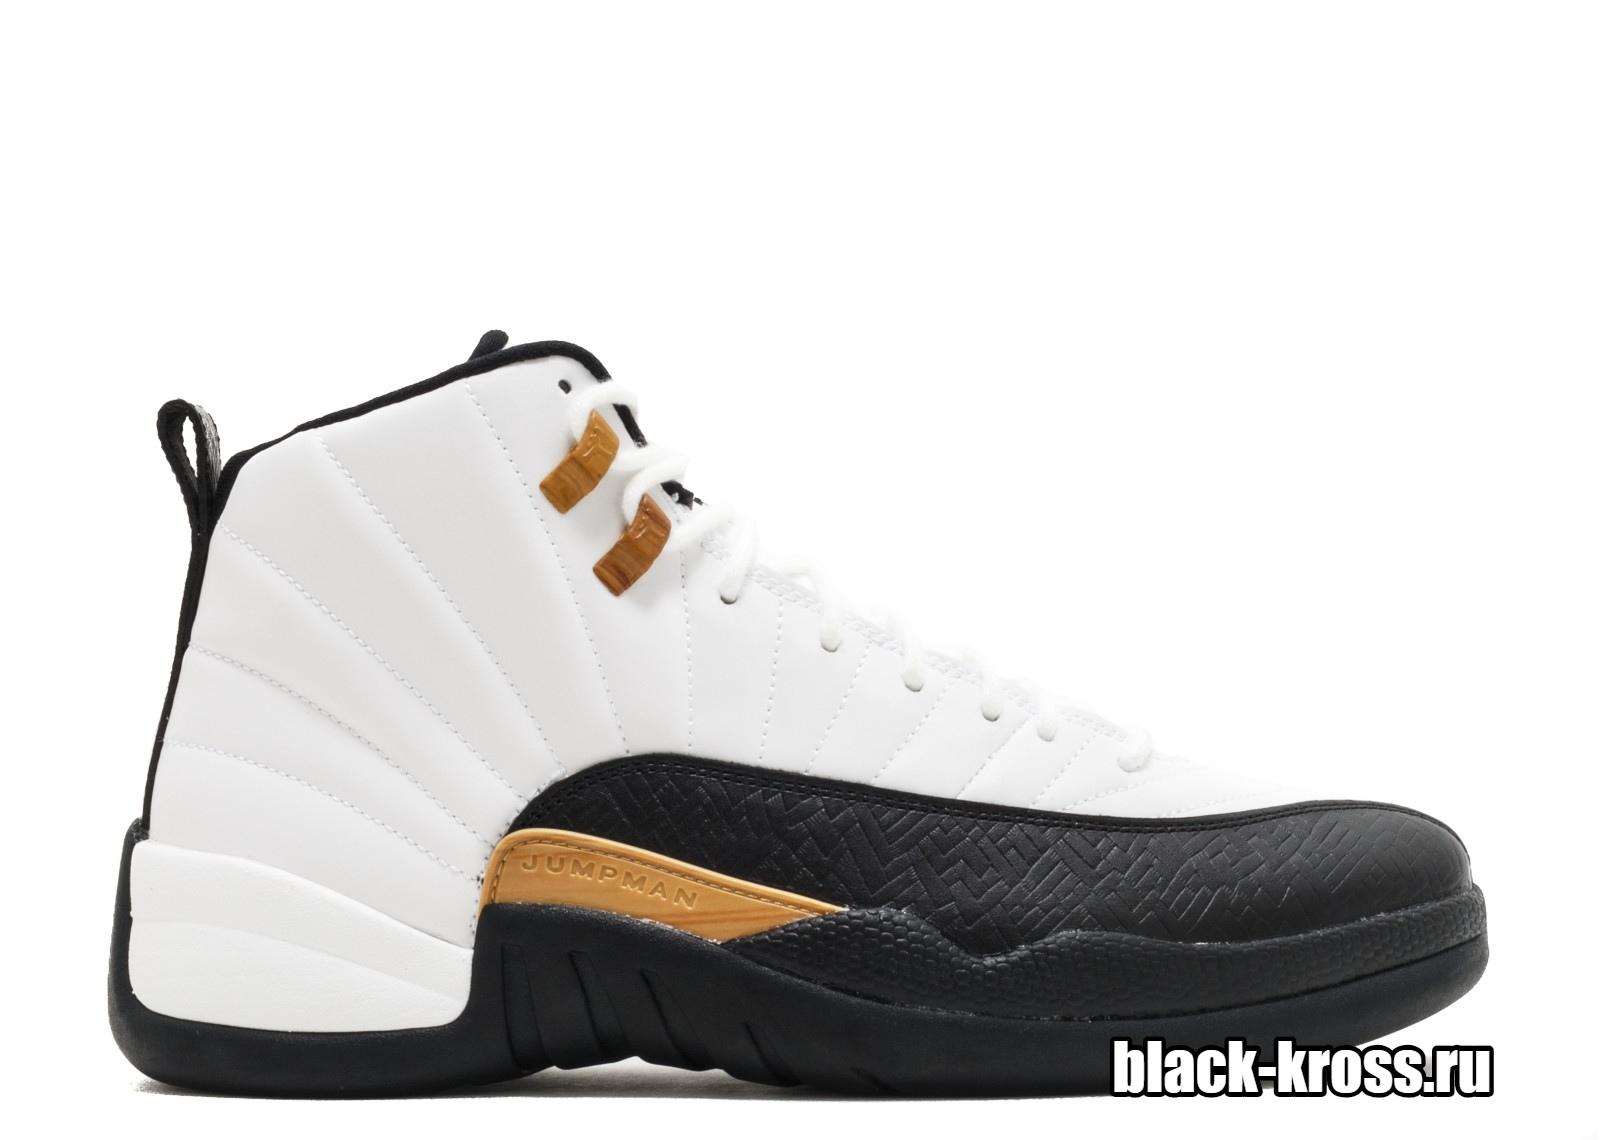 NIKE AIR JORDAN 12 RETRO White & Black  (41-46)